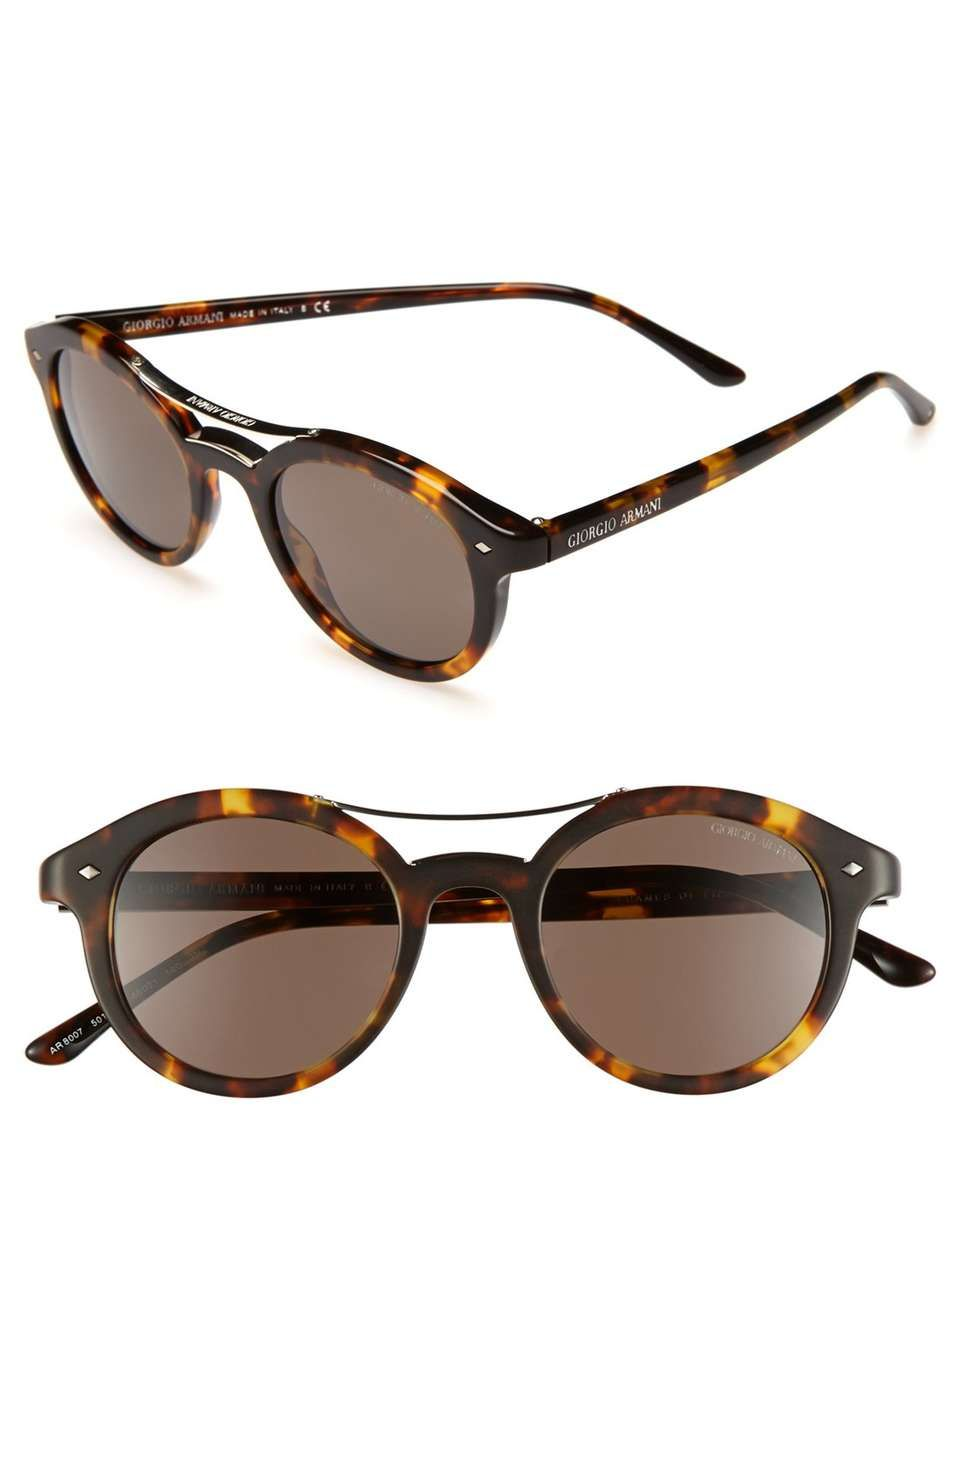 a7a430ef575 Giorgio Armani 46mm Sunglasses Armani Glasses